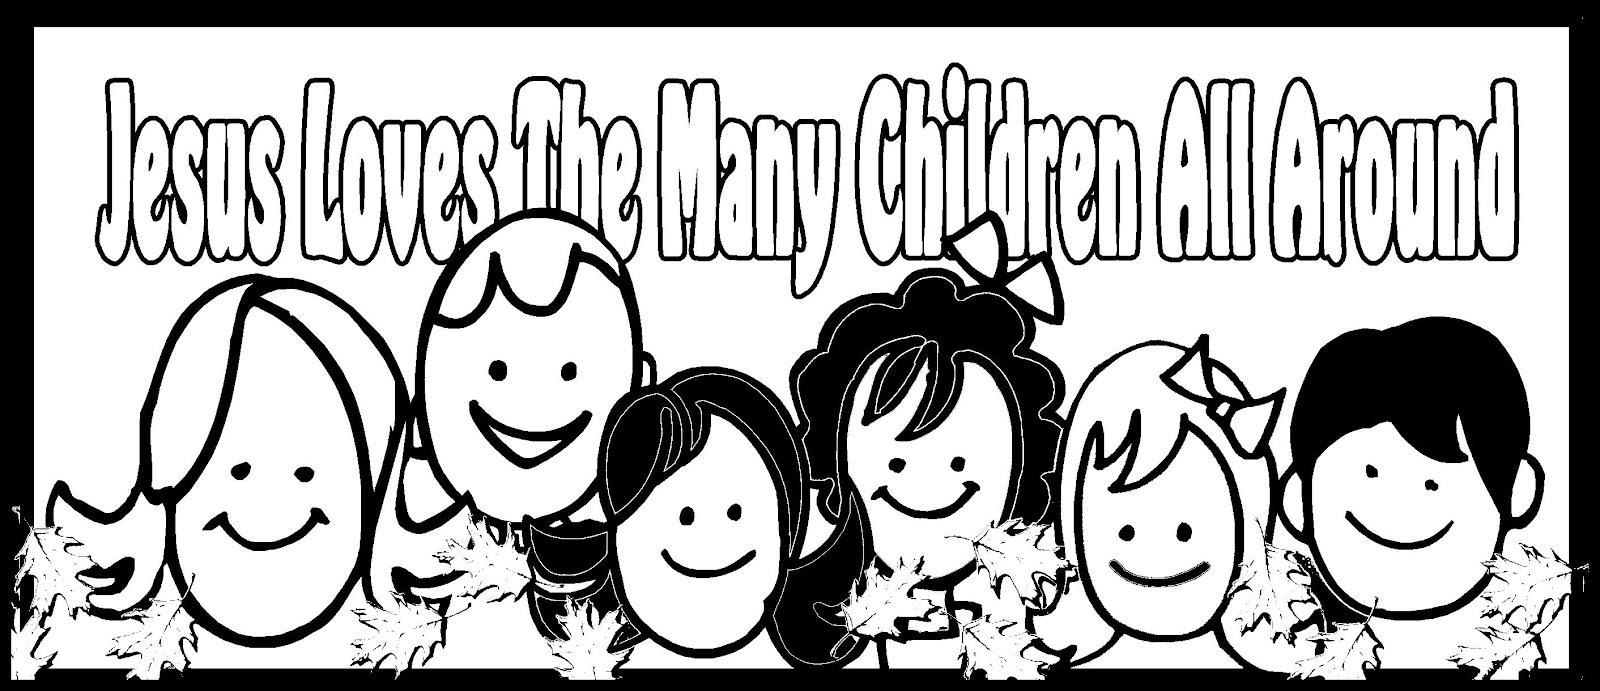 Childrens Gems In My Treasure Box Jesus Loves The Many